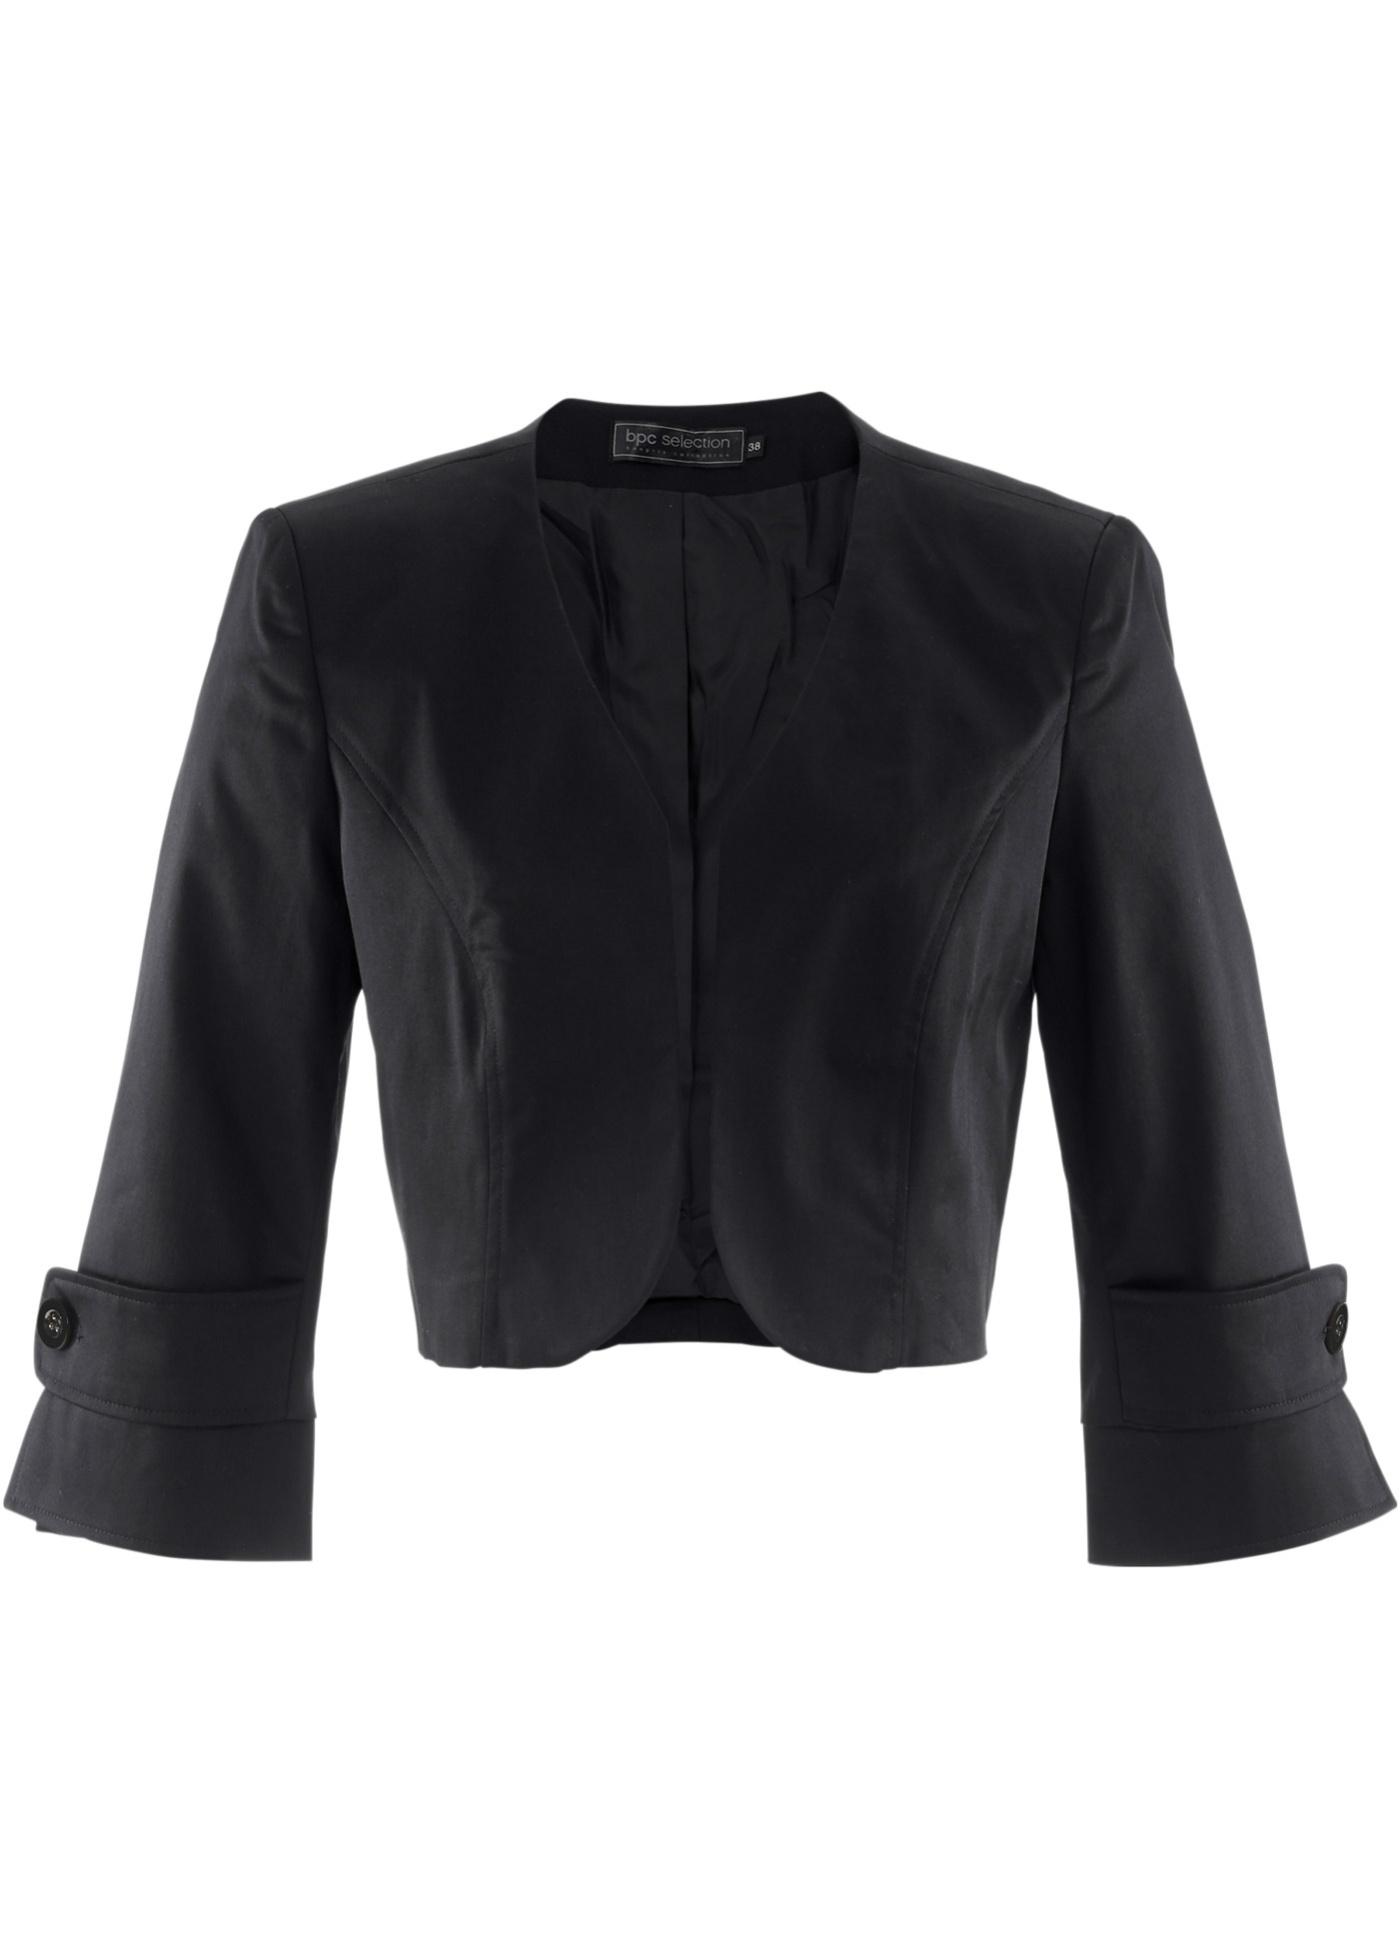 veste bolero femme jusqu 85 soldes premi re d marque. Black Bedroom Furniture Sets. Home Design Ideas